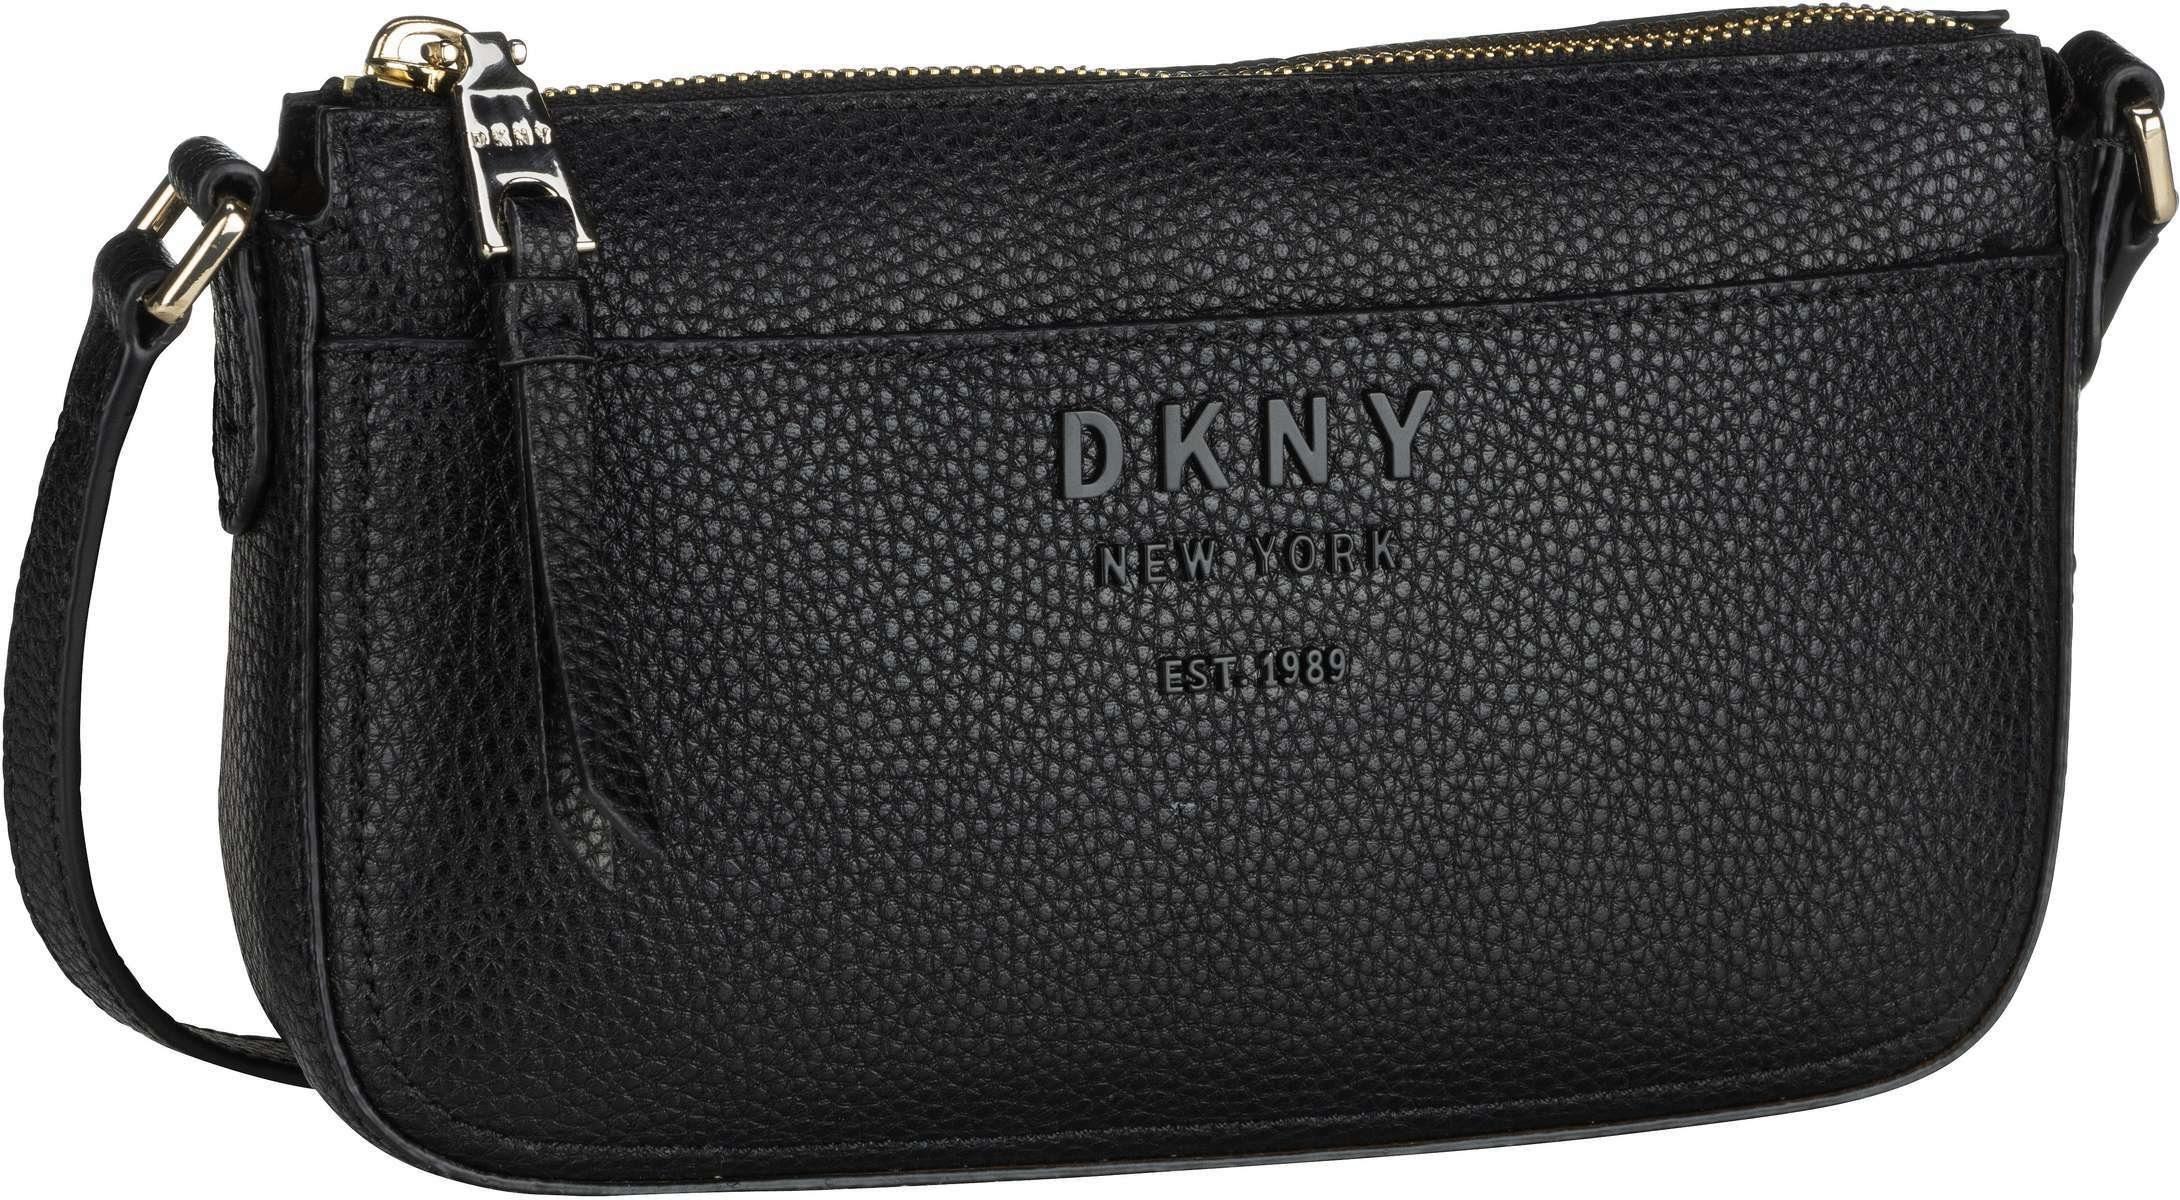 DKNY Noho Pebble Demi : Umhängetaschen Querformat von DKNY